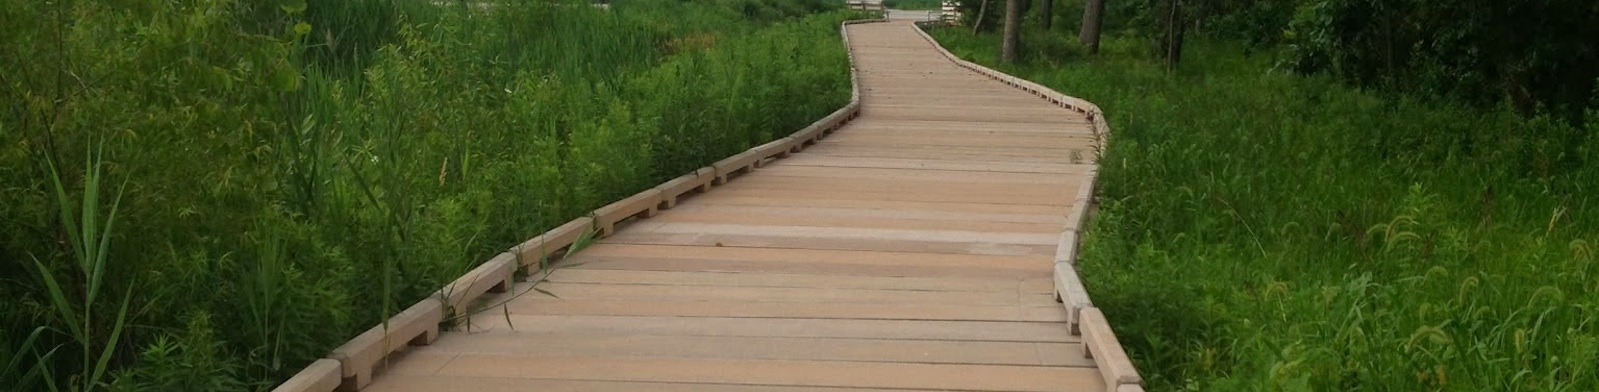 Northside Portage Business Park Permatrak boardwalk